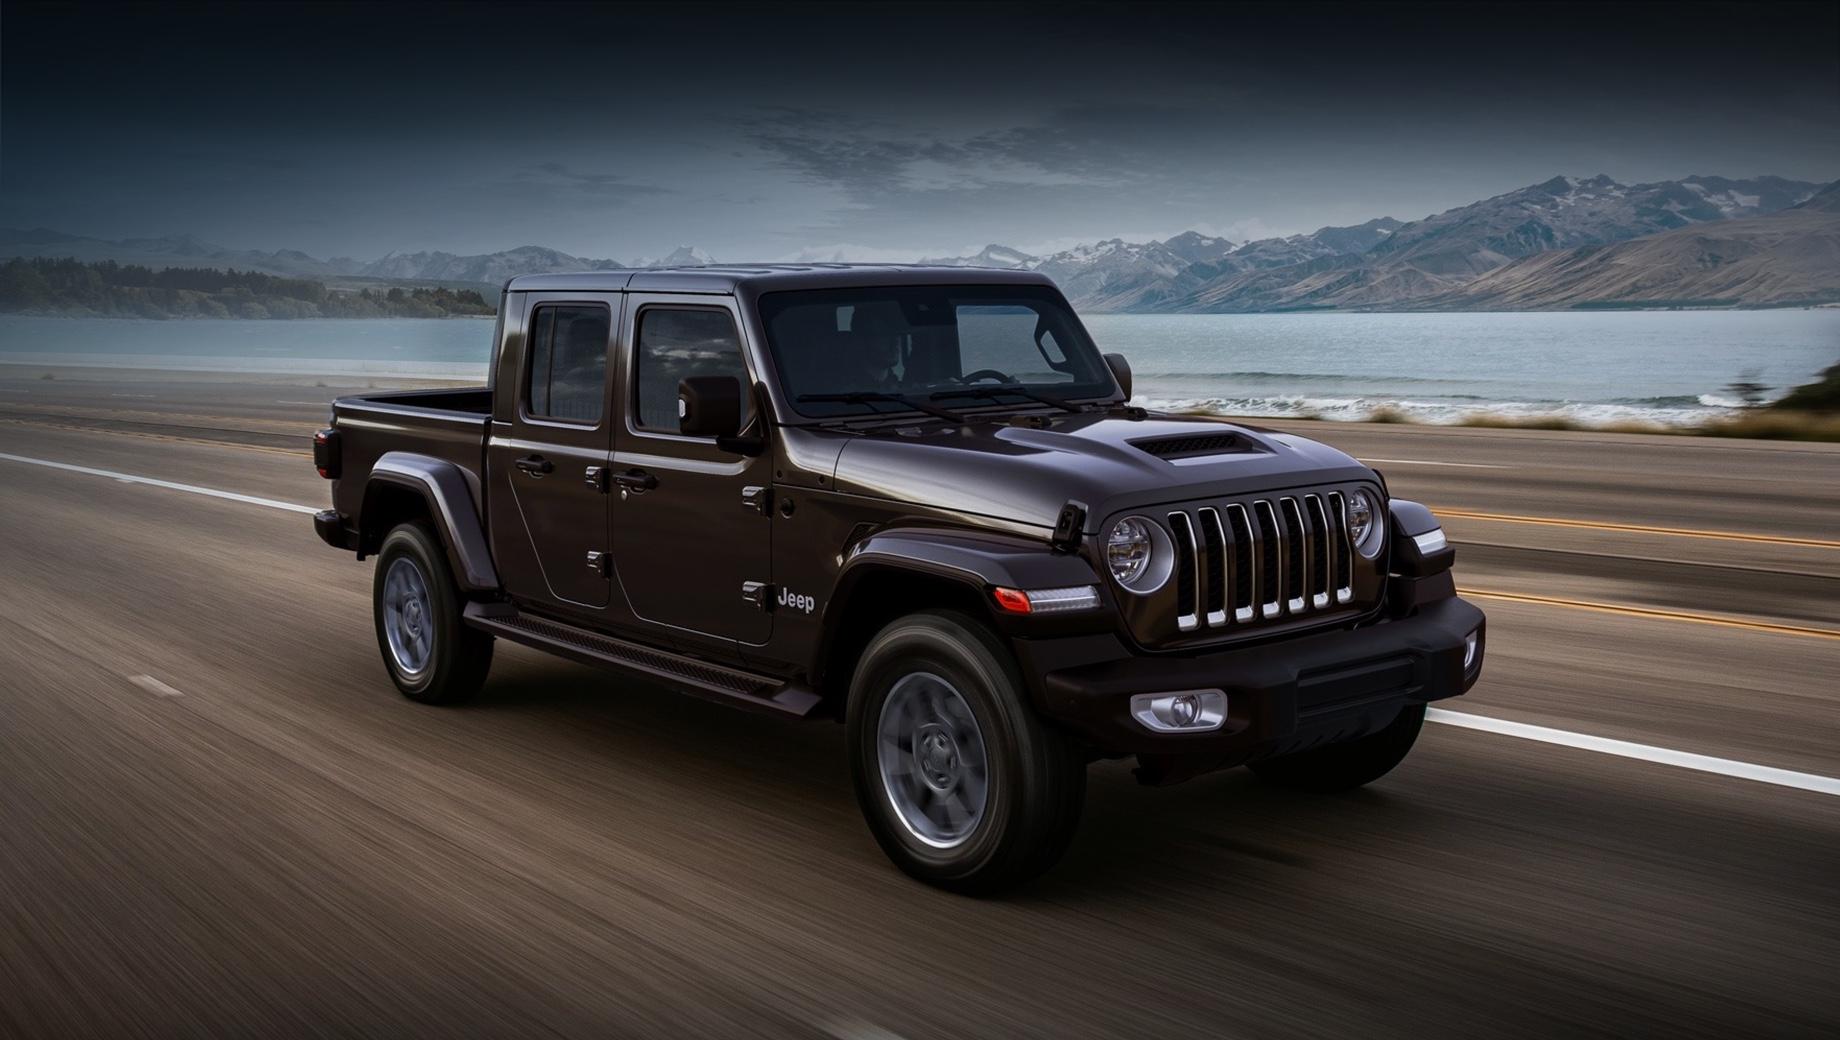 Начались продажи пикапа Jeep Gladiator в Европе